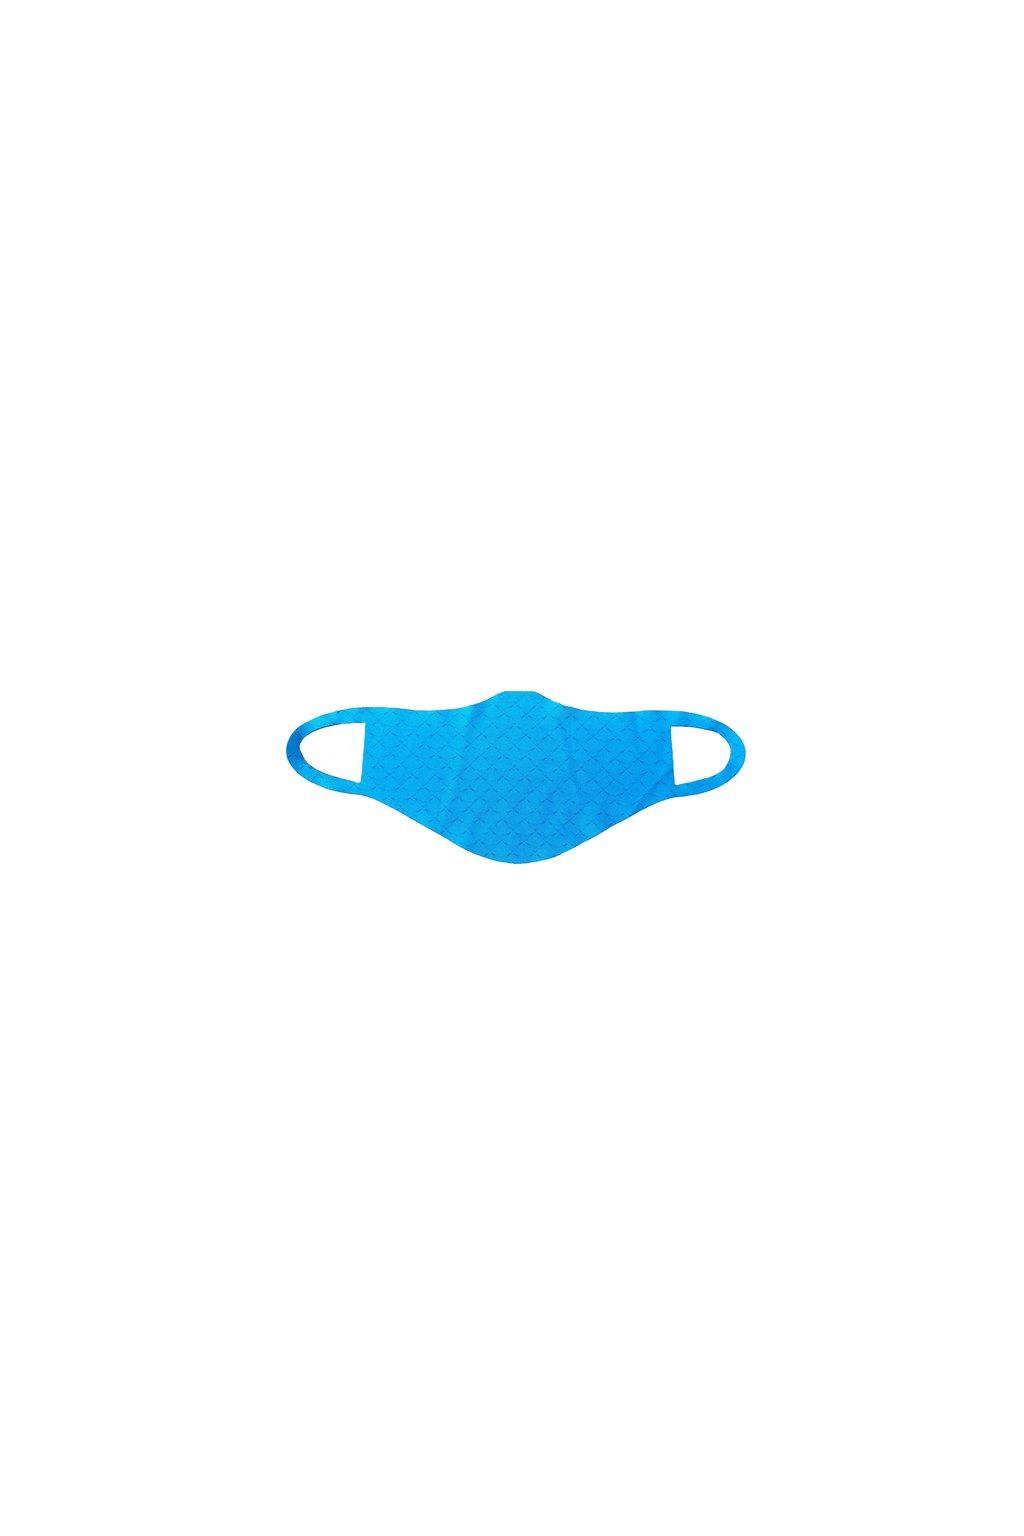 Maska Higieniczna Blue Mirage MOH 11X7 18131 679x706